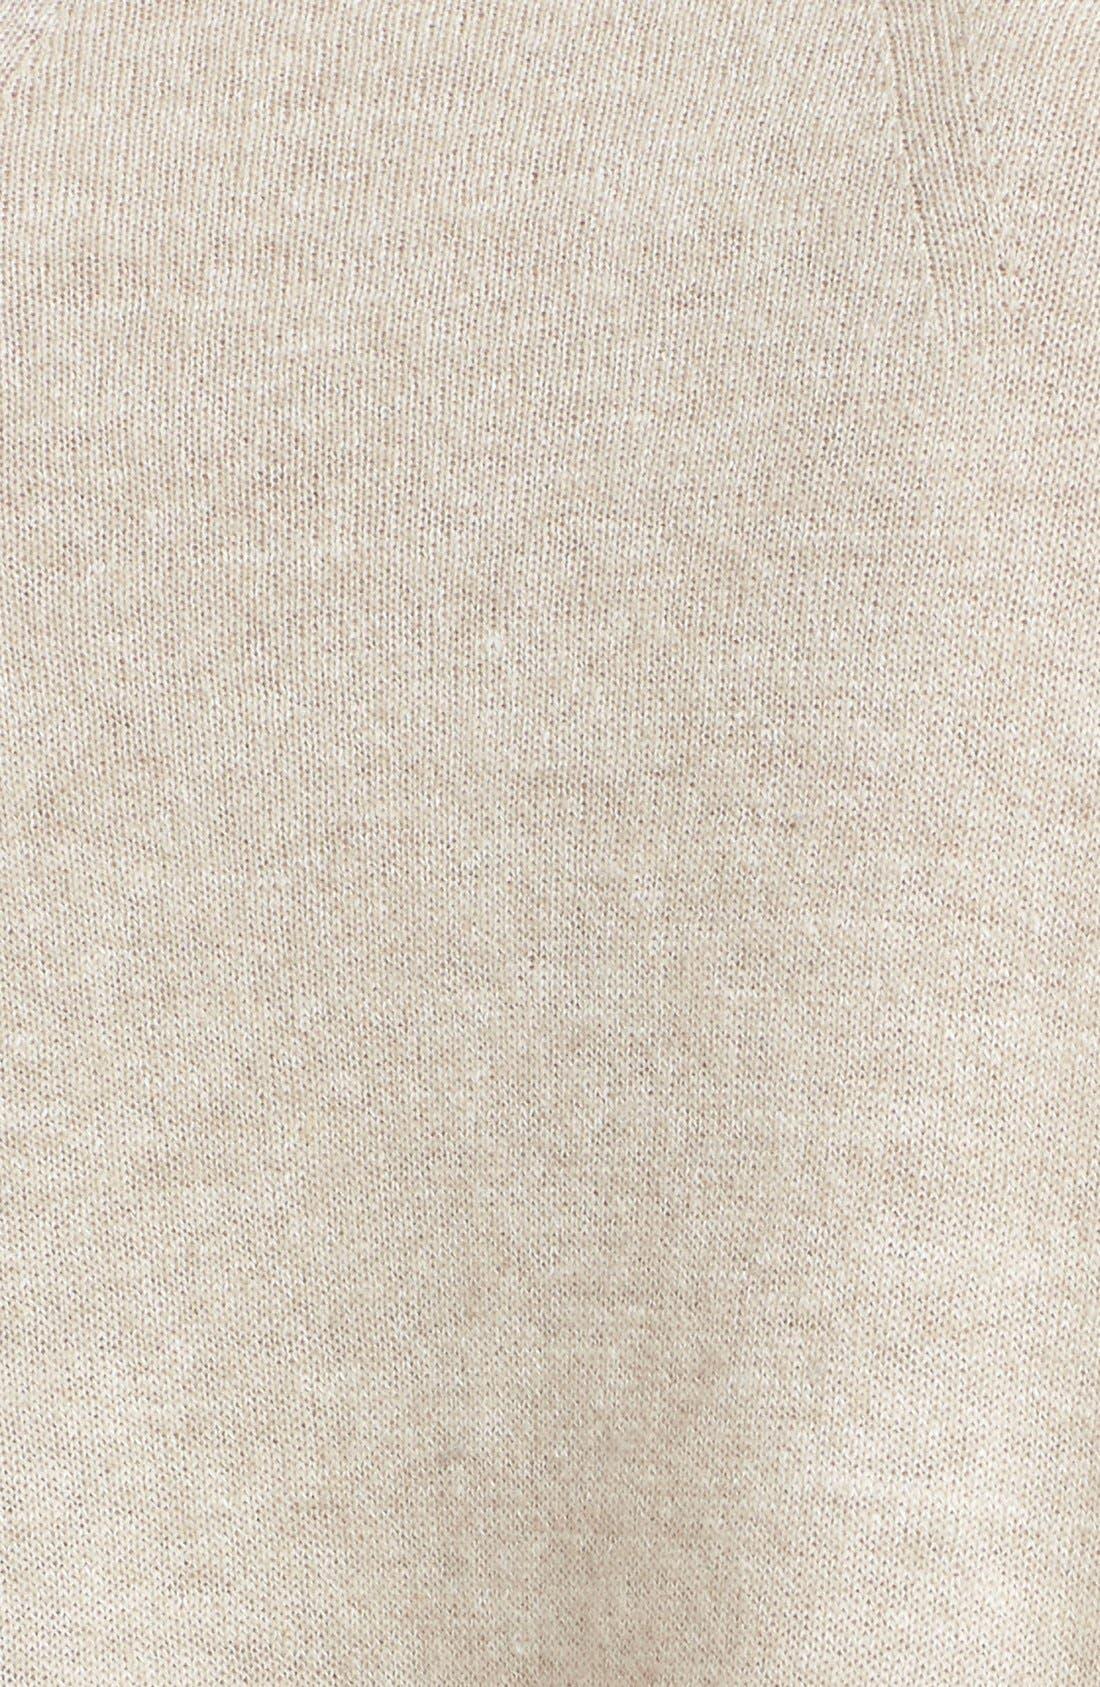 Linen & Cashmere Pullover,                             Alternate thumbnail 5, color,                             280